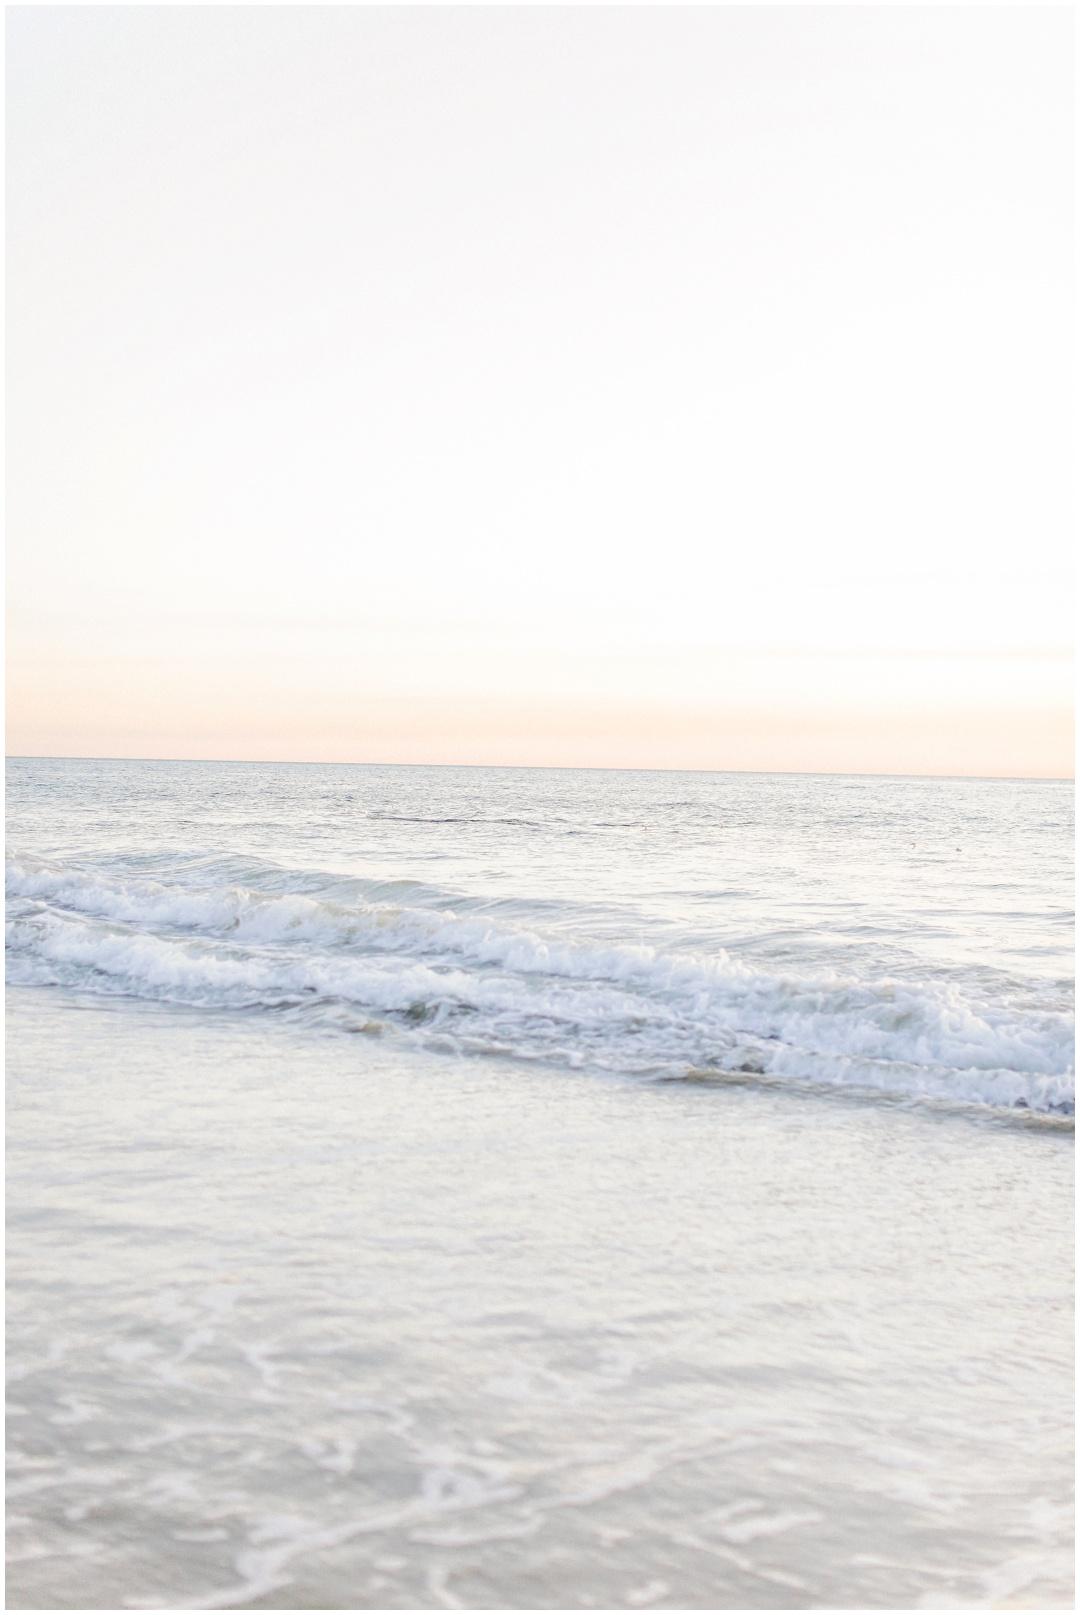 Newport_Beach_Newborn_Photographer_Newport_Beach_Maternity_Photographer_Orange_County_Family_Photographer_Cori_Kleckner_Photography_Huntington_Beach_Photographer_Shelby_Kemper_Family_Jared_Kemper__2949.jpg